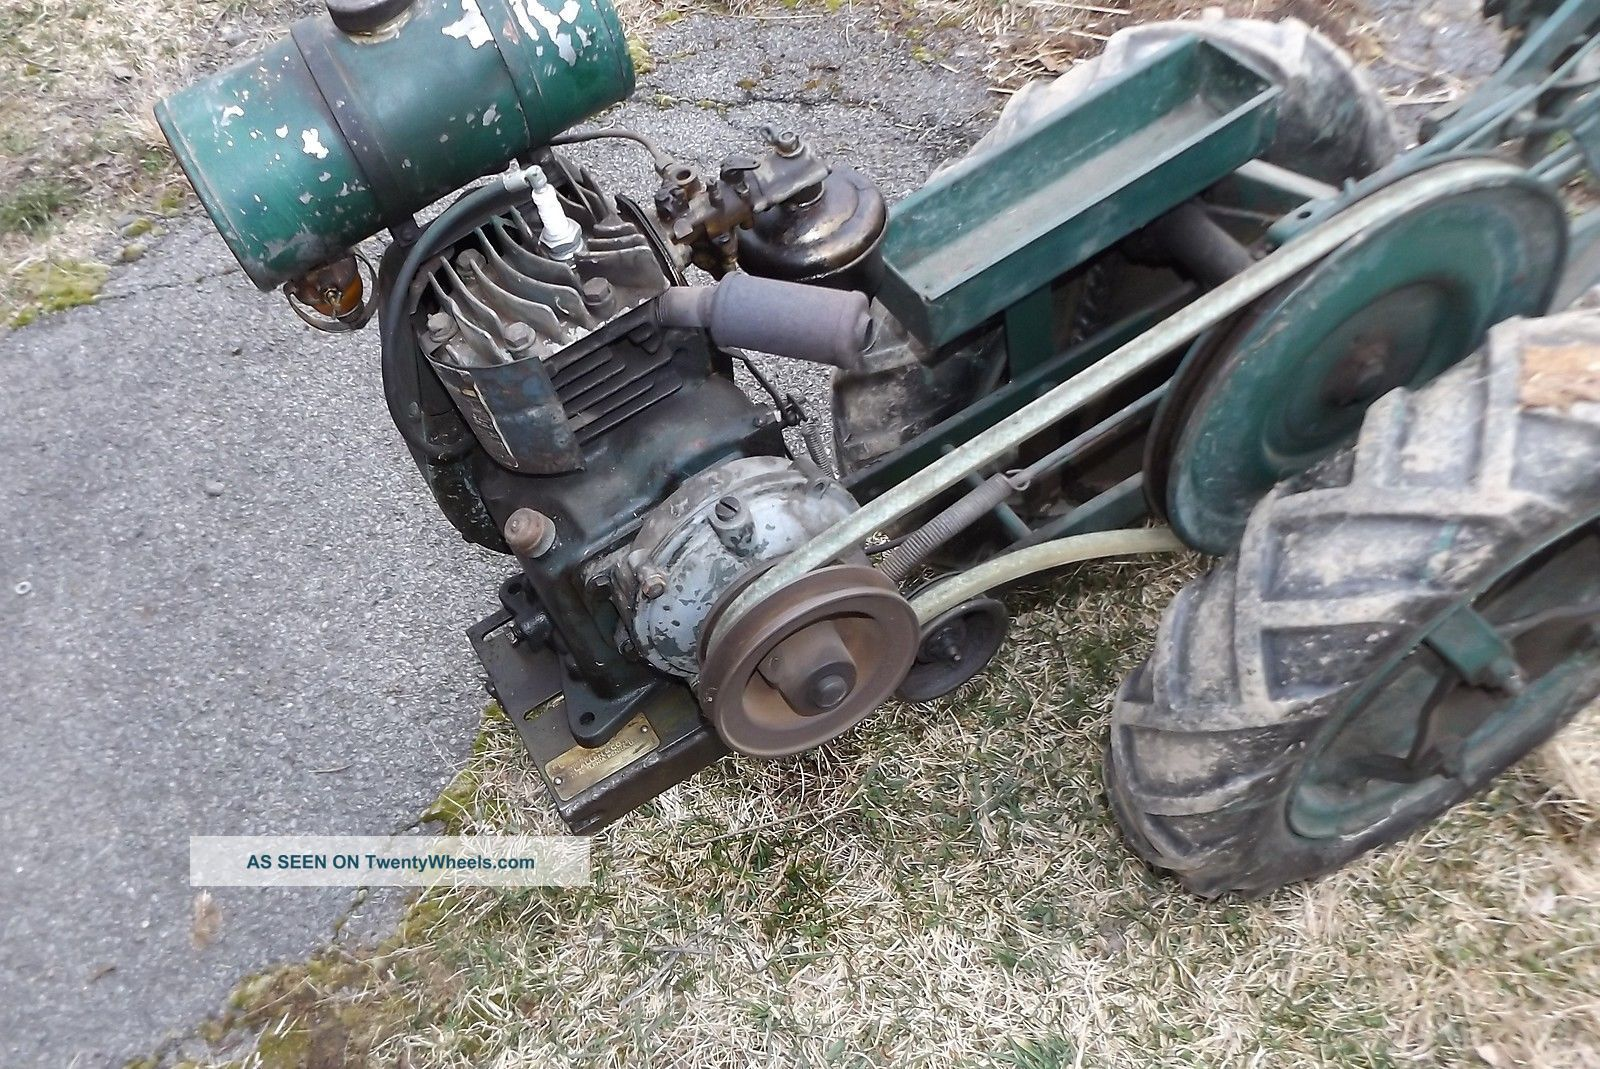 Vintage Planet Jr Walk Behind Garden Tractor With